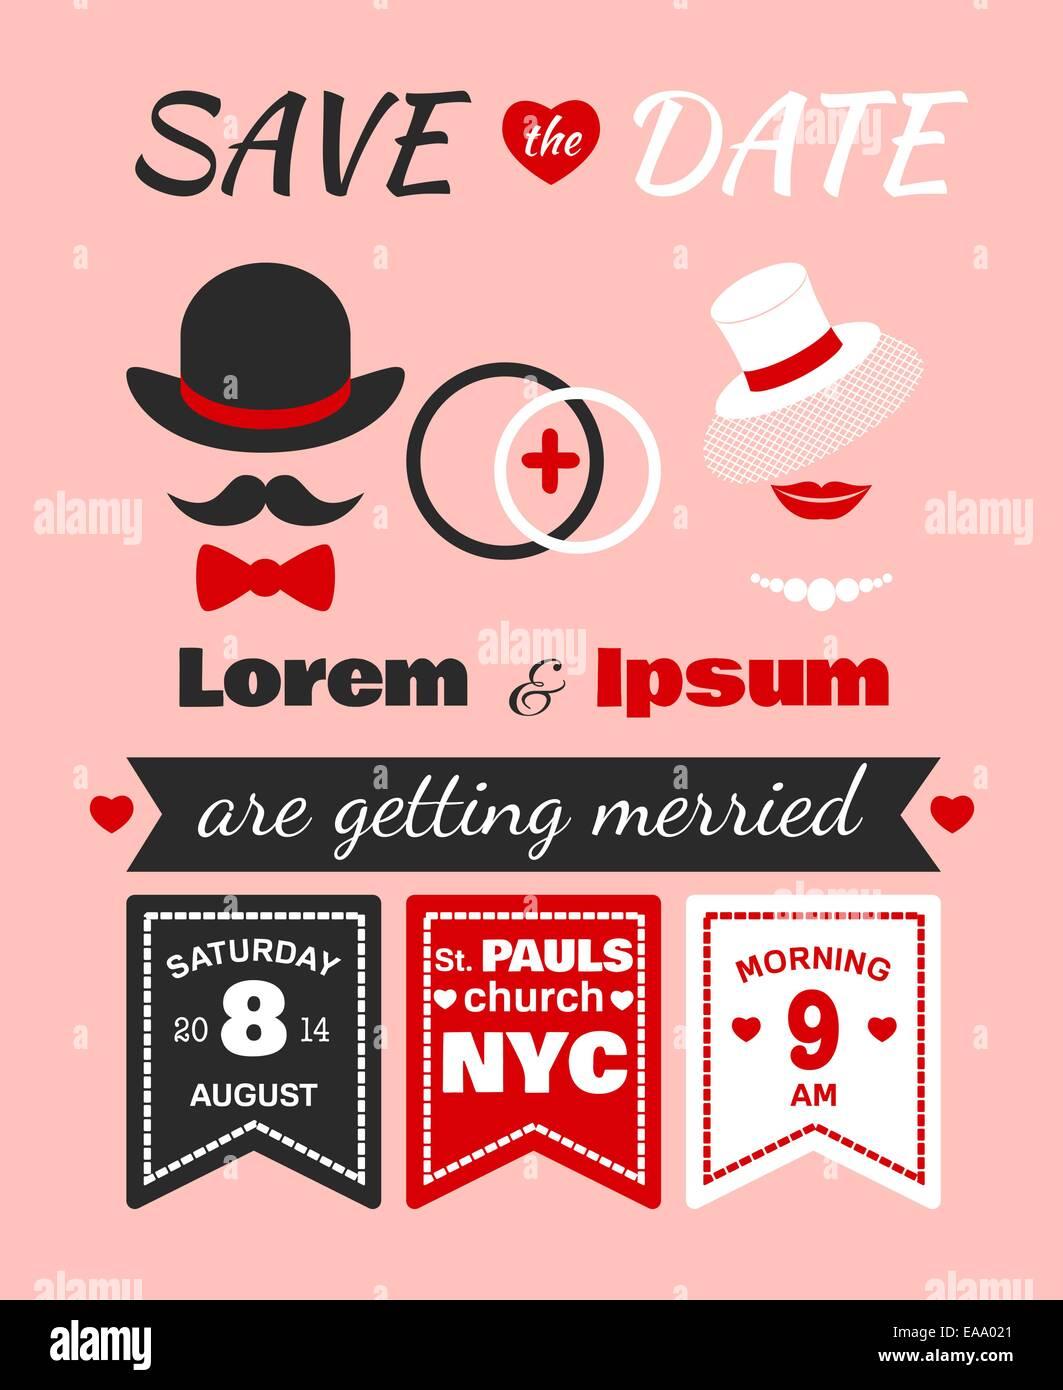 Hipster Wedding Invitation Card Stock Photos & Hipster Wedding ...